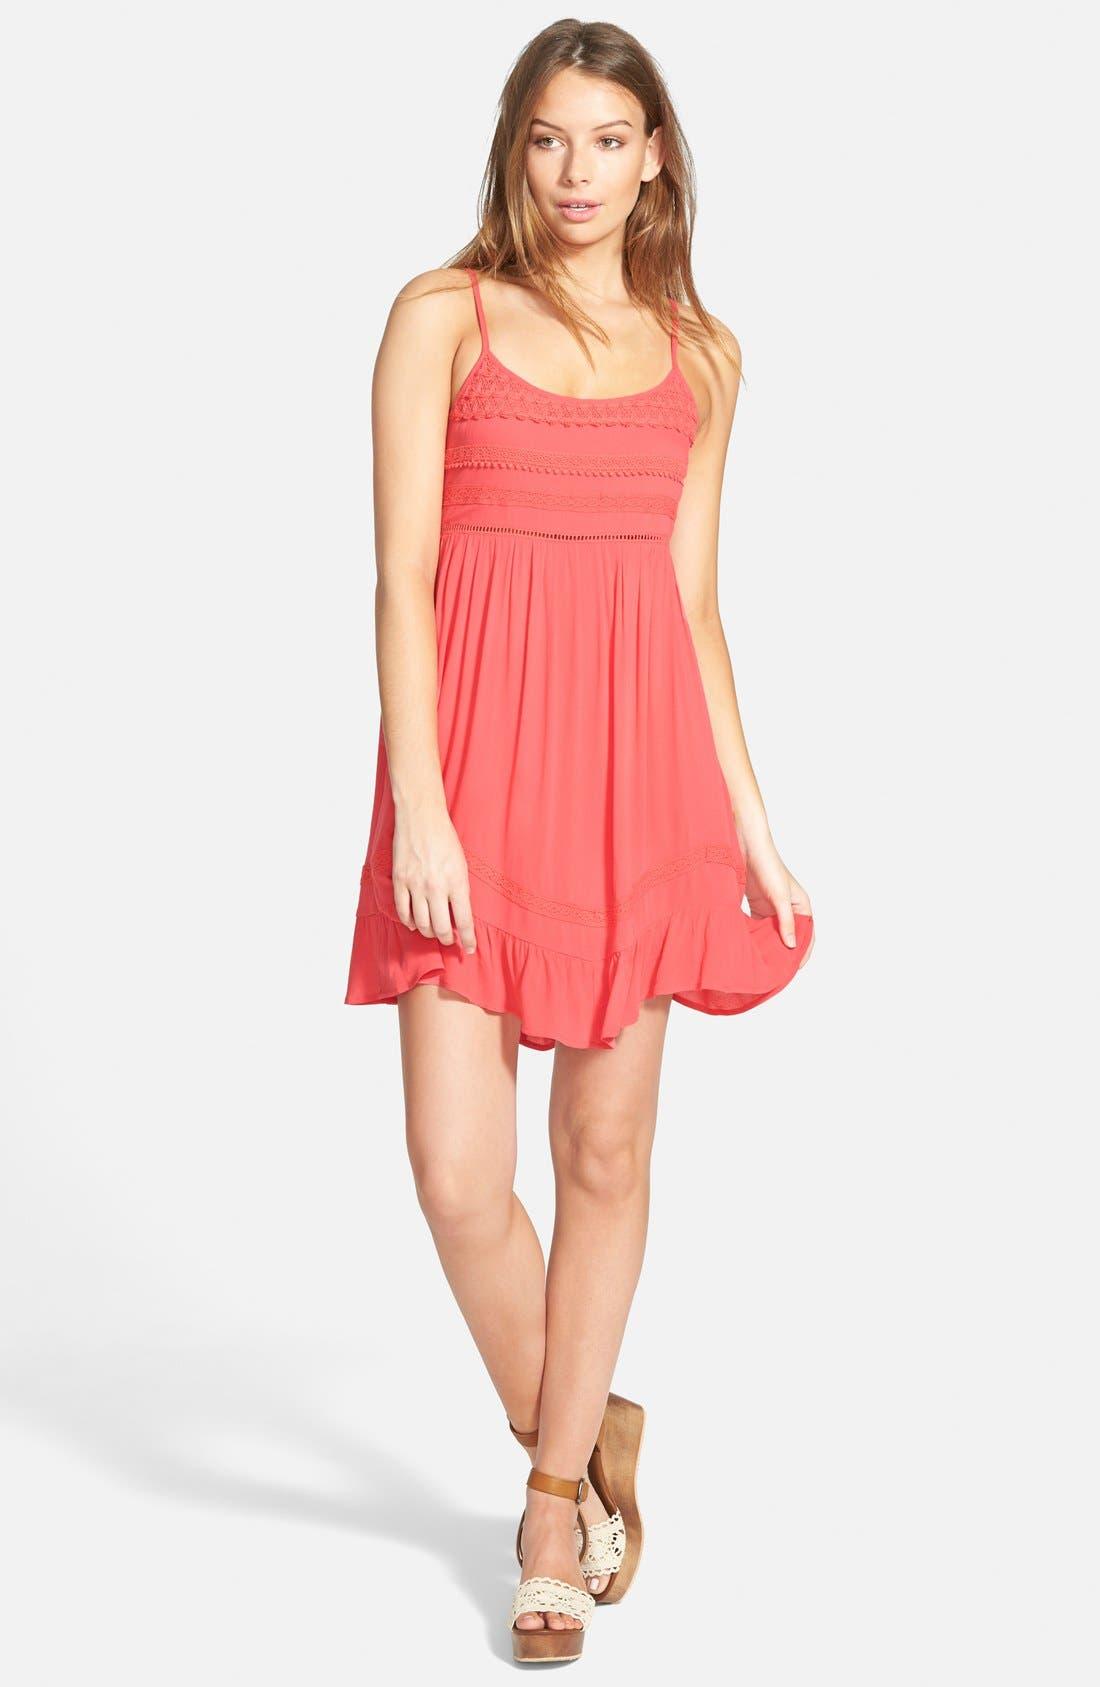 Main Image - Socialite Crochet Babydoll Dress